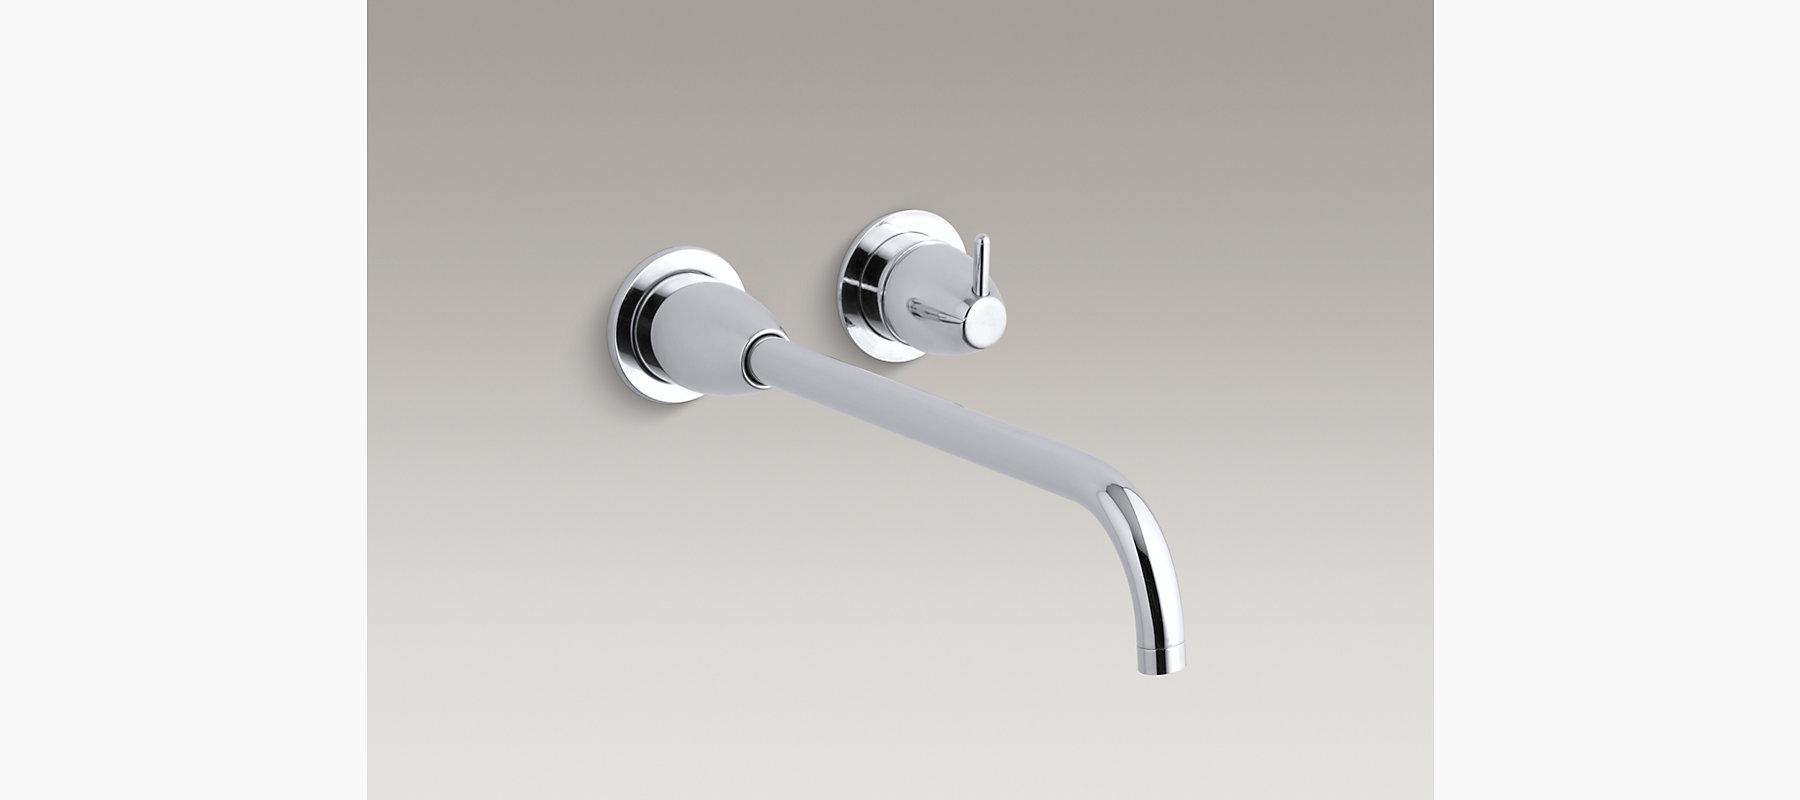 Falling Water Original Design Wall-Mount Sink Faucet Trim | K-T199 ...